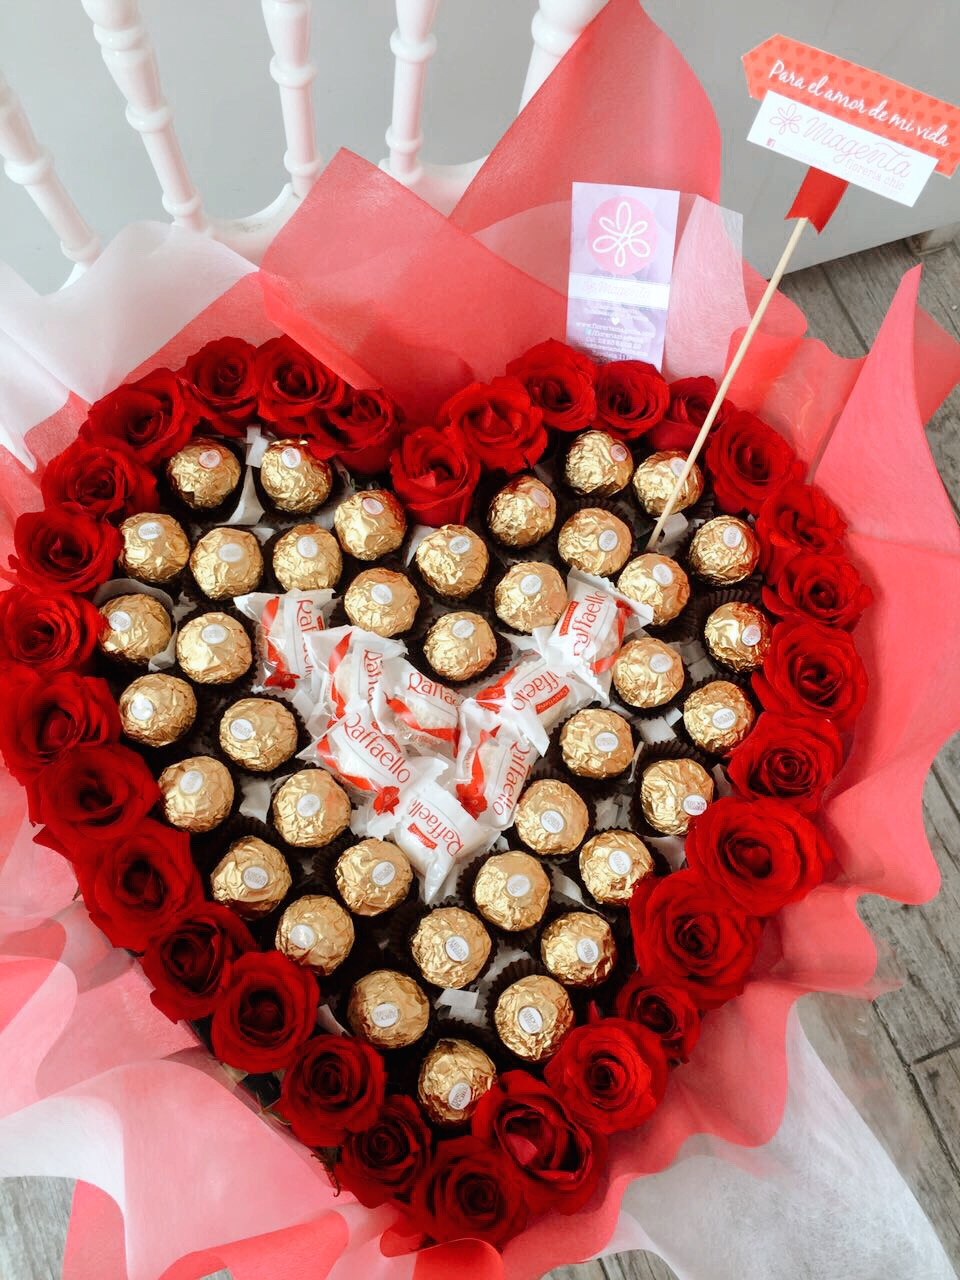 San Valentín Ideas Y Tips De Regalos Para Sorprender A Tu Pareja Dress Up Live Up